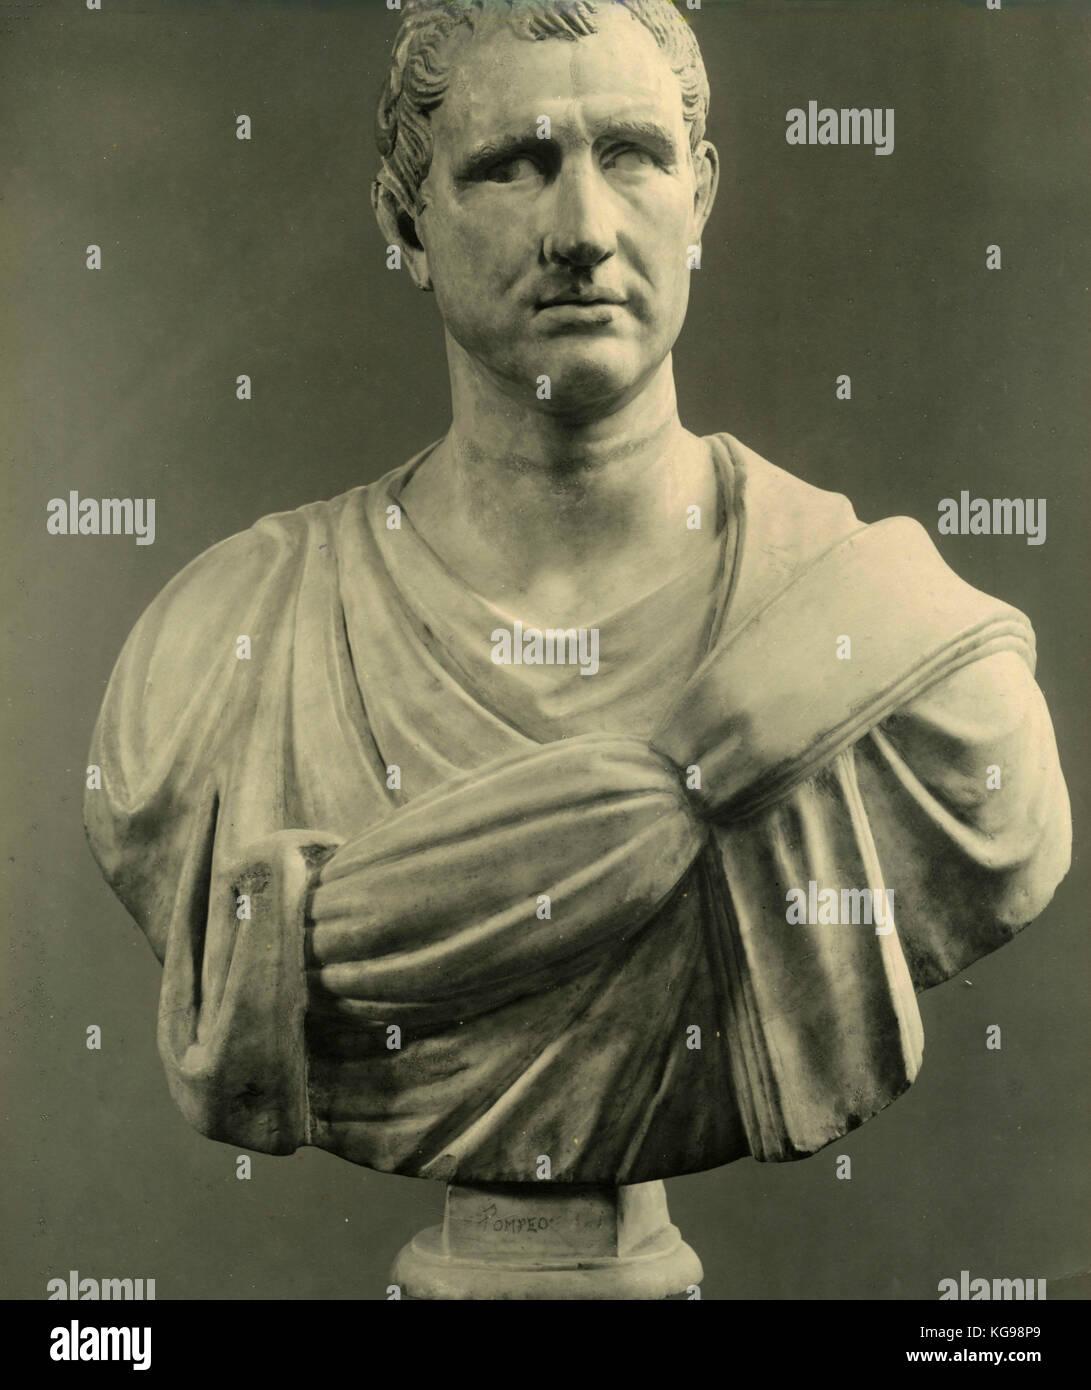 Pompeus Magnus, marble bust statue - Stock Image